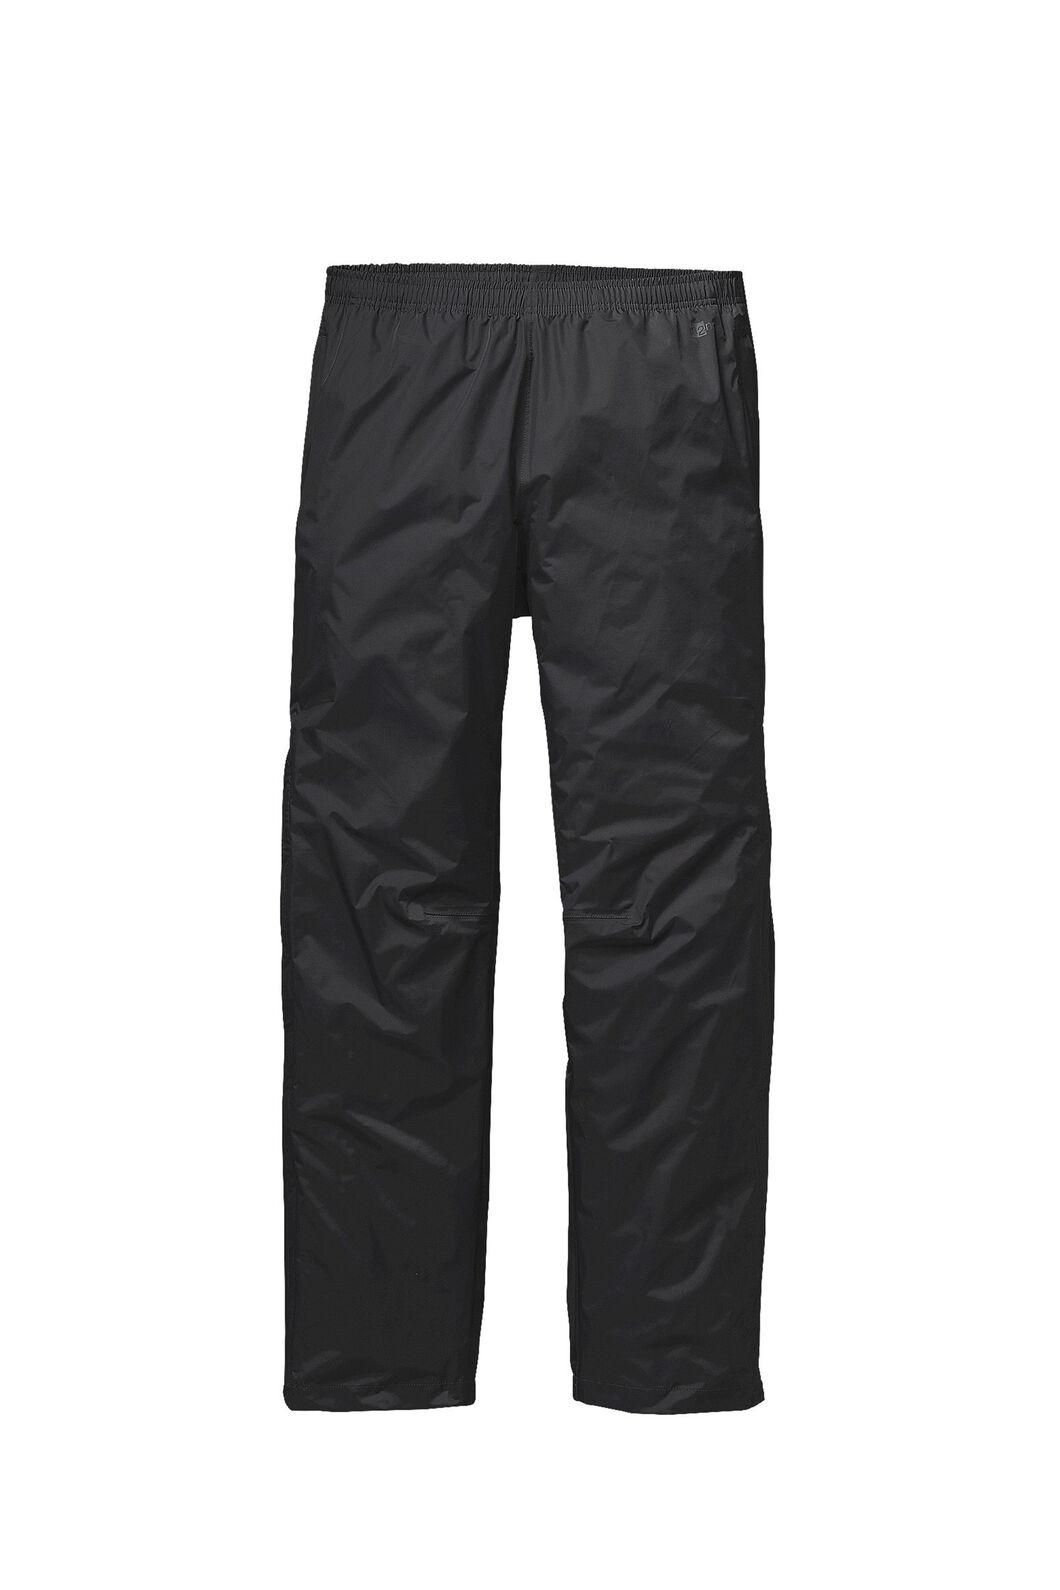 Patagonia Men's Torrentshell Pant, Black, hi-res